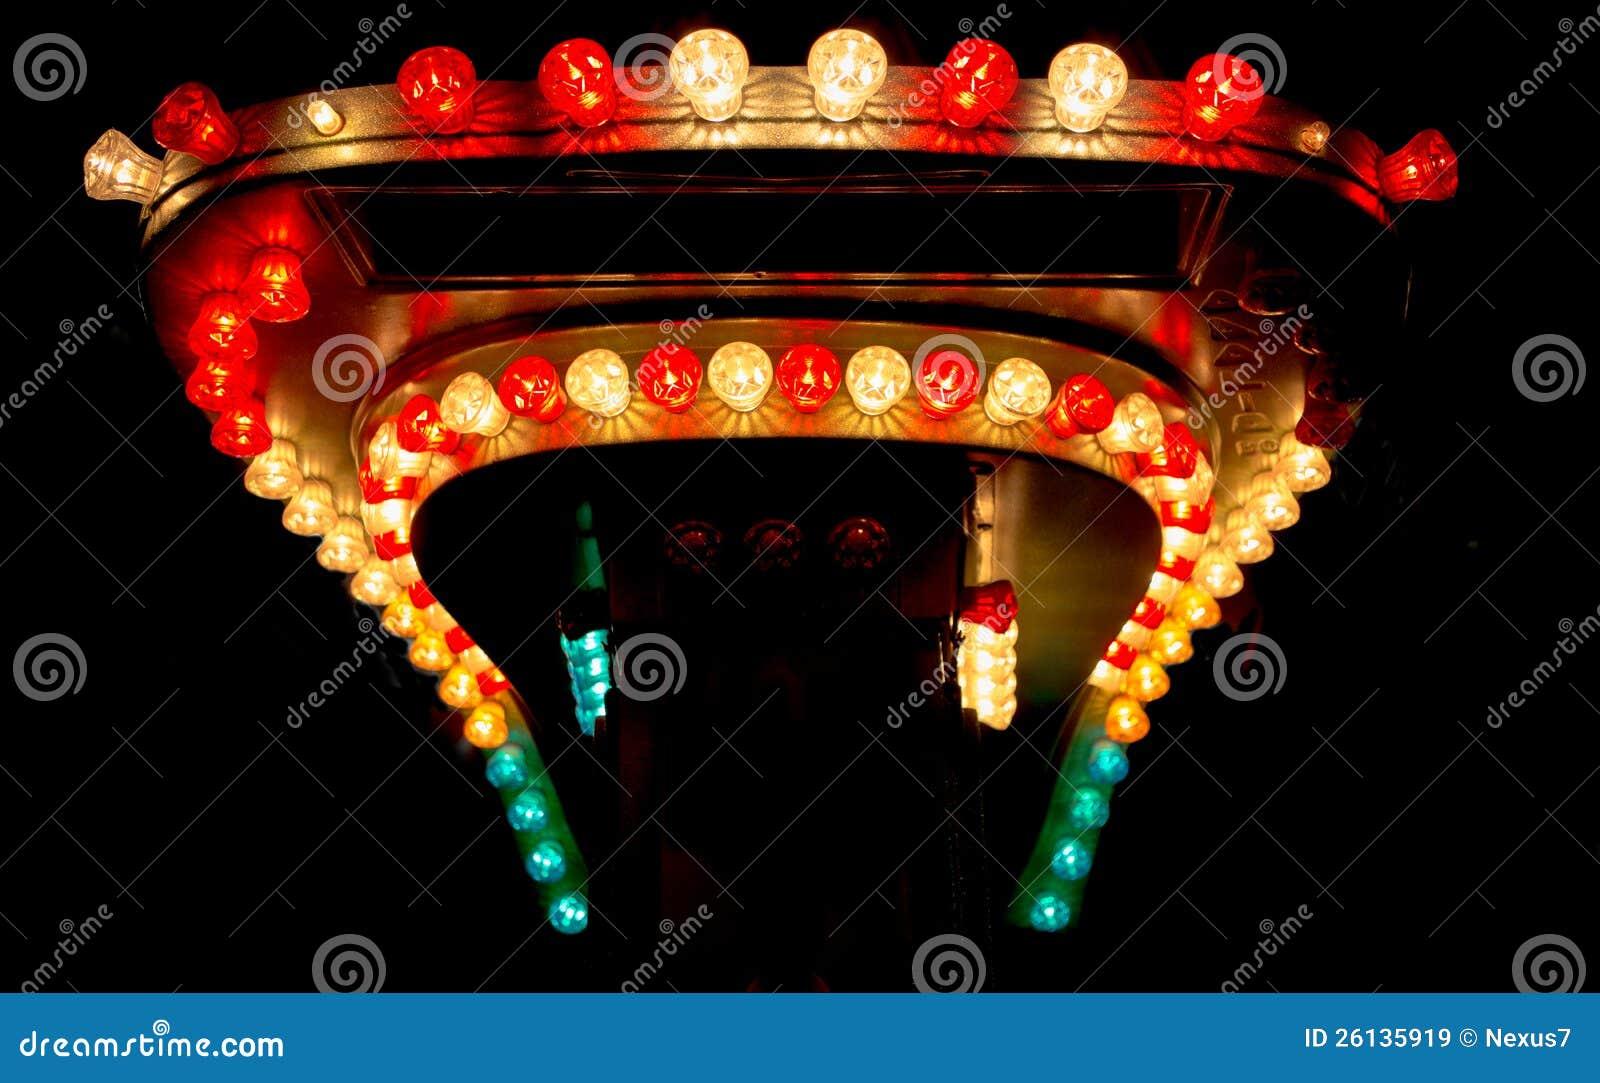 Glühlampen vom Funfair